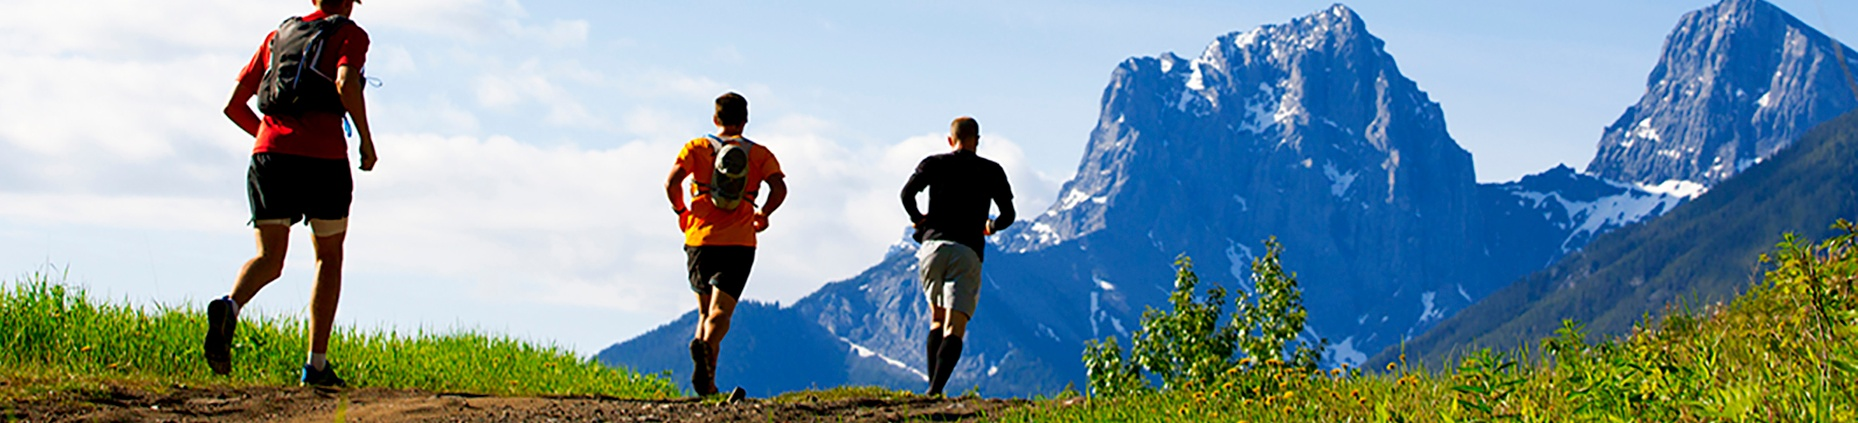 5 Key Influences on Sales Motivation